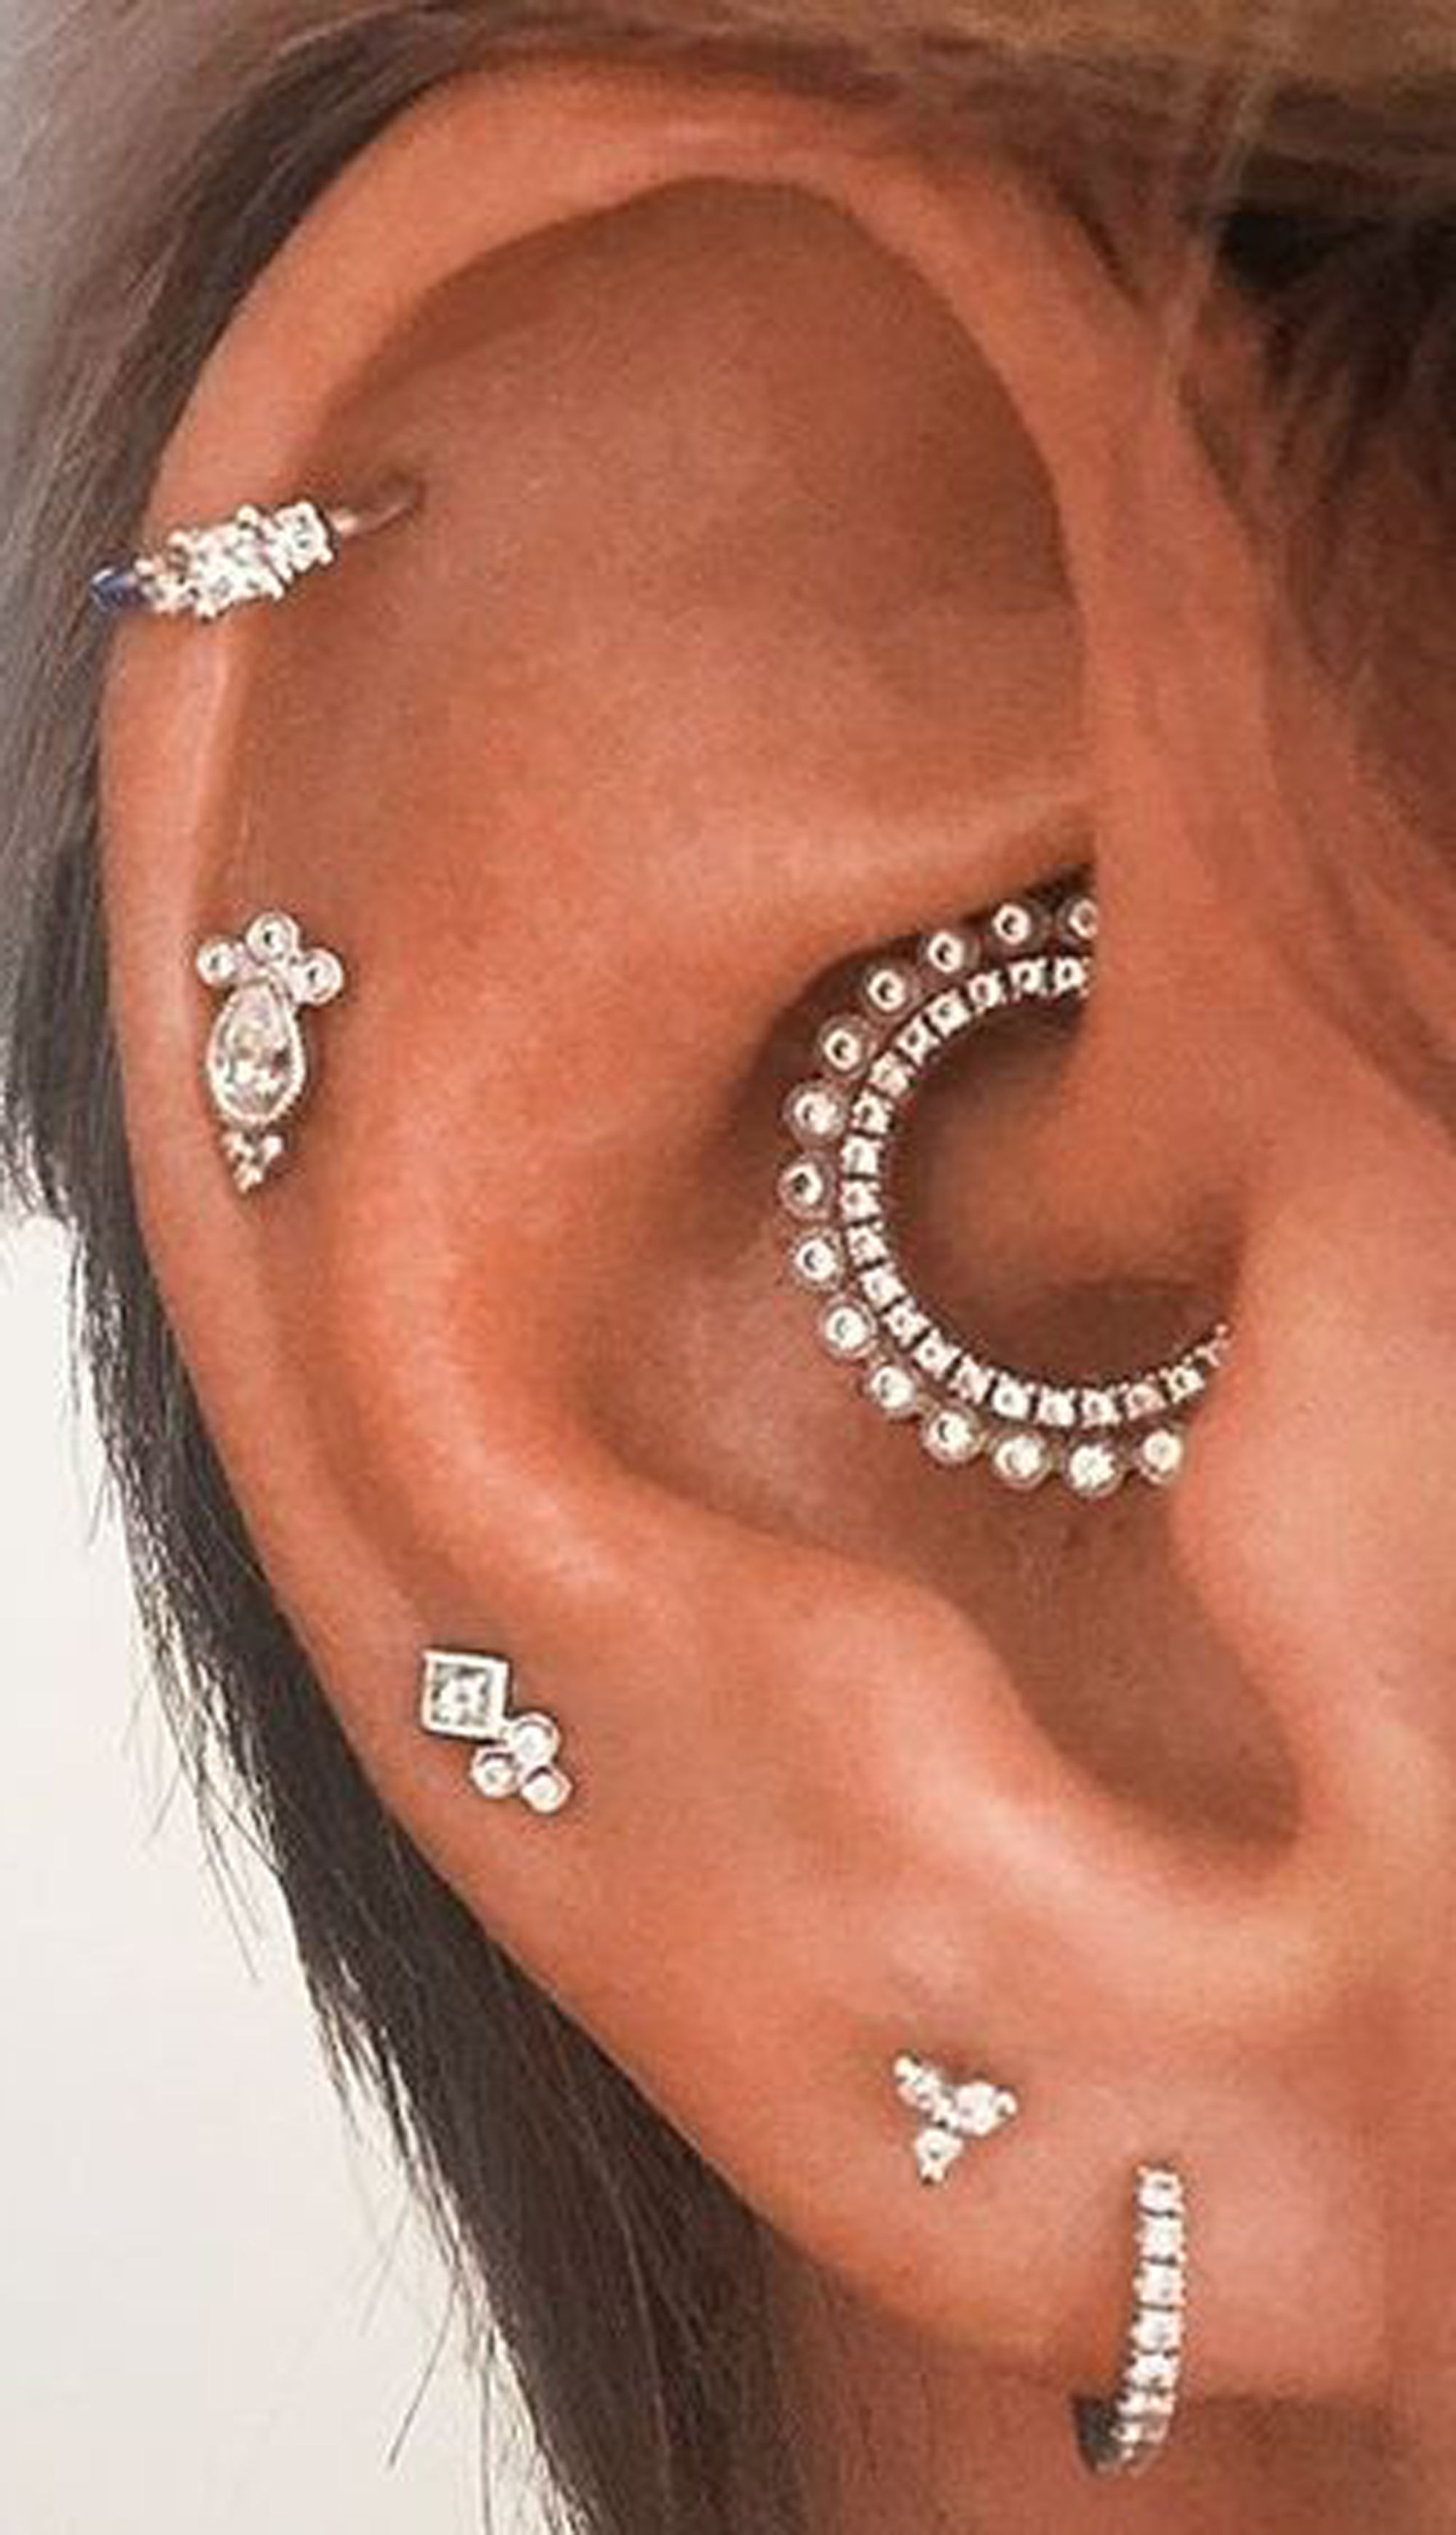 Pretty piercing ideas  Cute Multiple Ear Piercing Ideas for Cartilage Helix Daith Jewelry